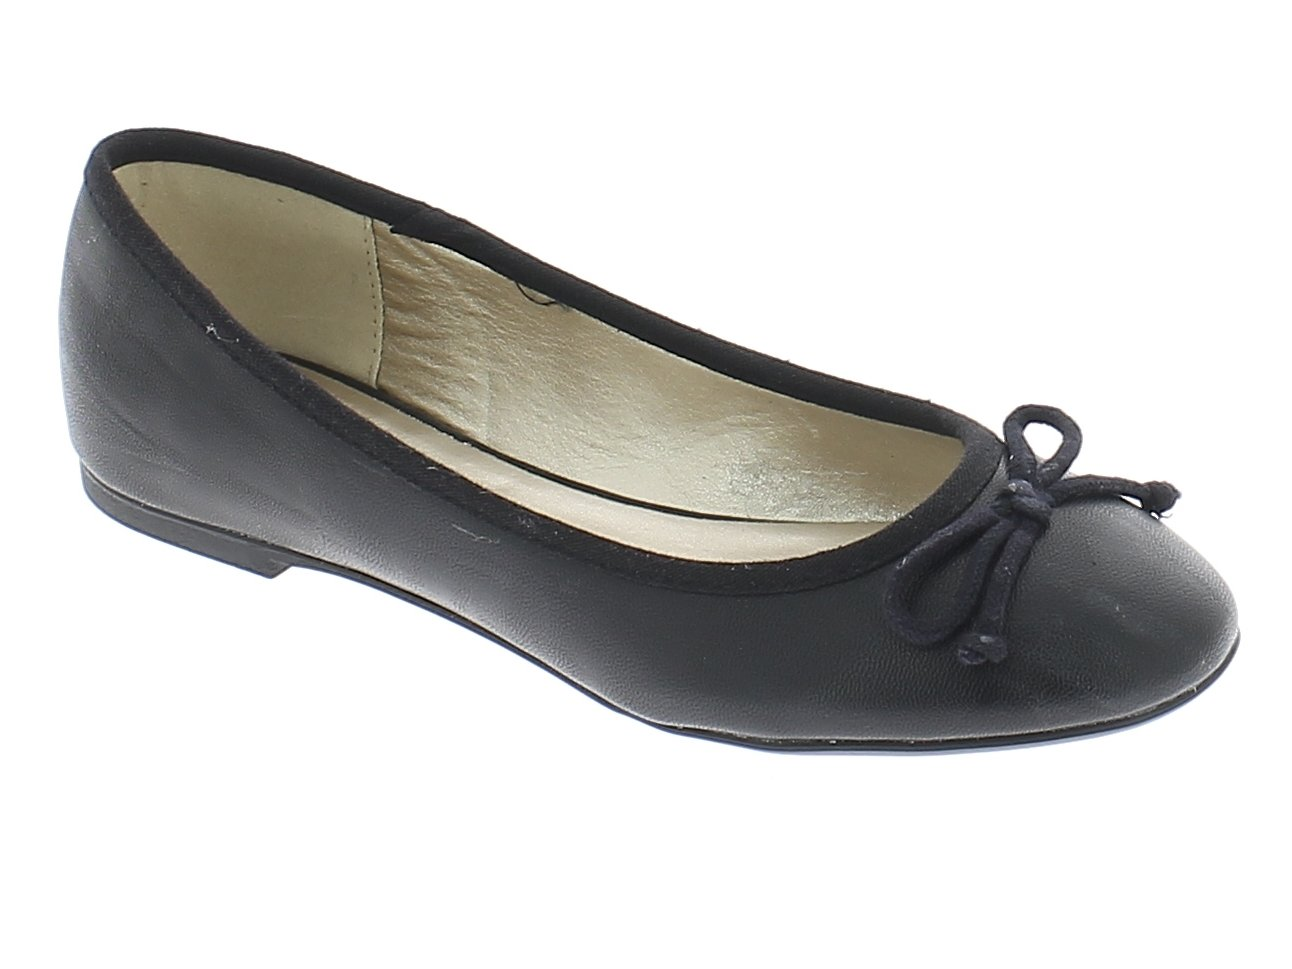 IQSHOES Γυναικείες Μπαλαρίνες 4385137501 Μαύρο - IqShoes - 4385137501 BLACK blac προϊόντα παπούτσια